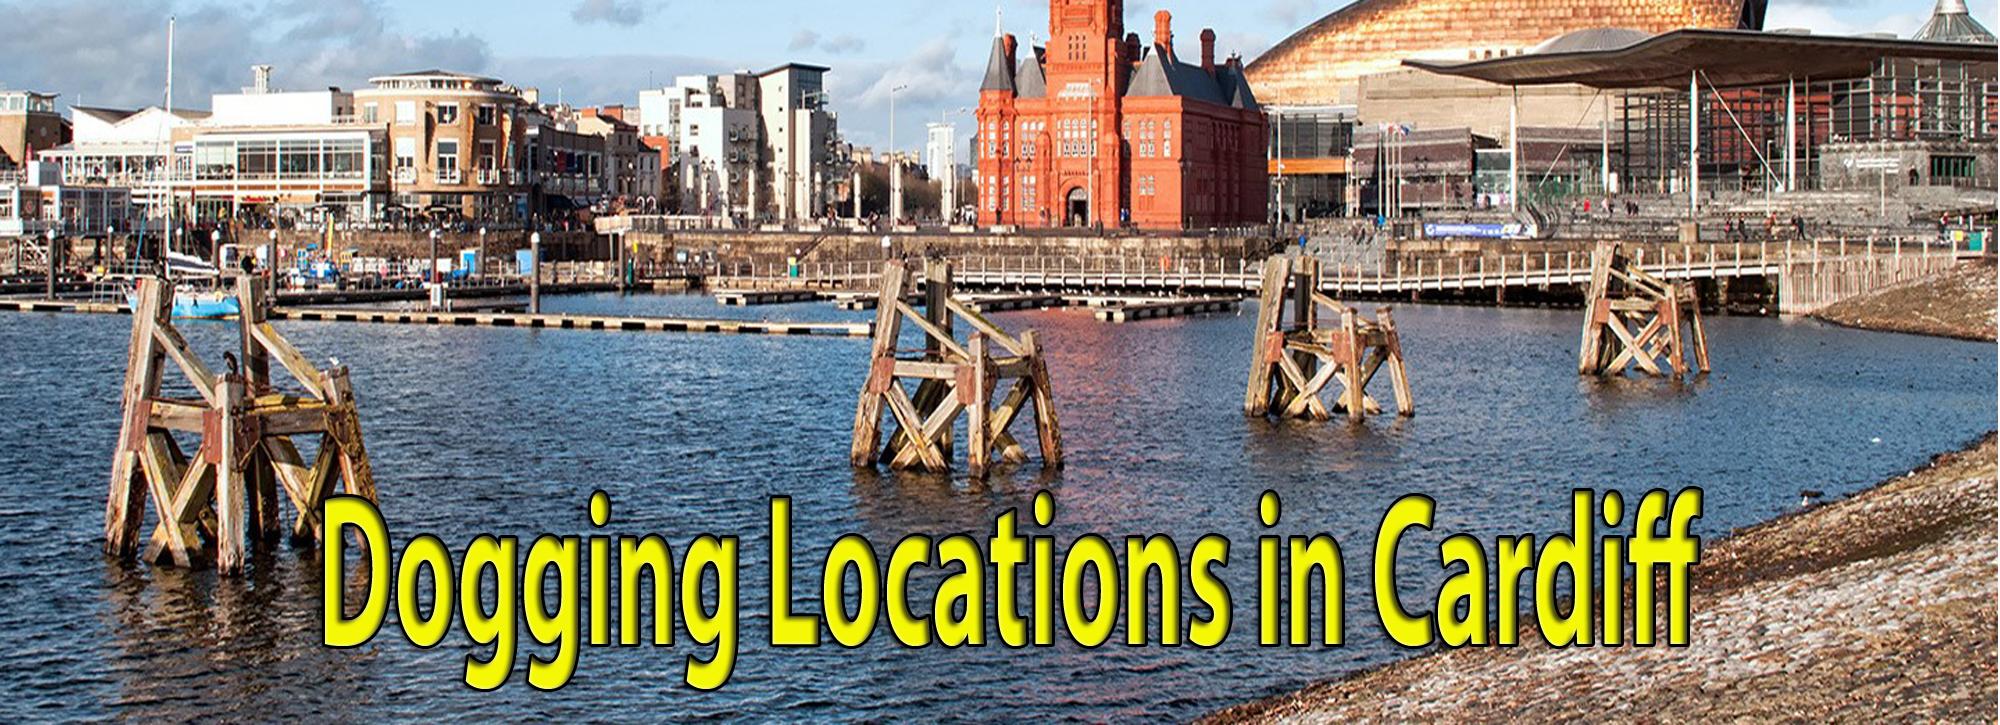 Dogging-in-Cardiff